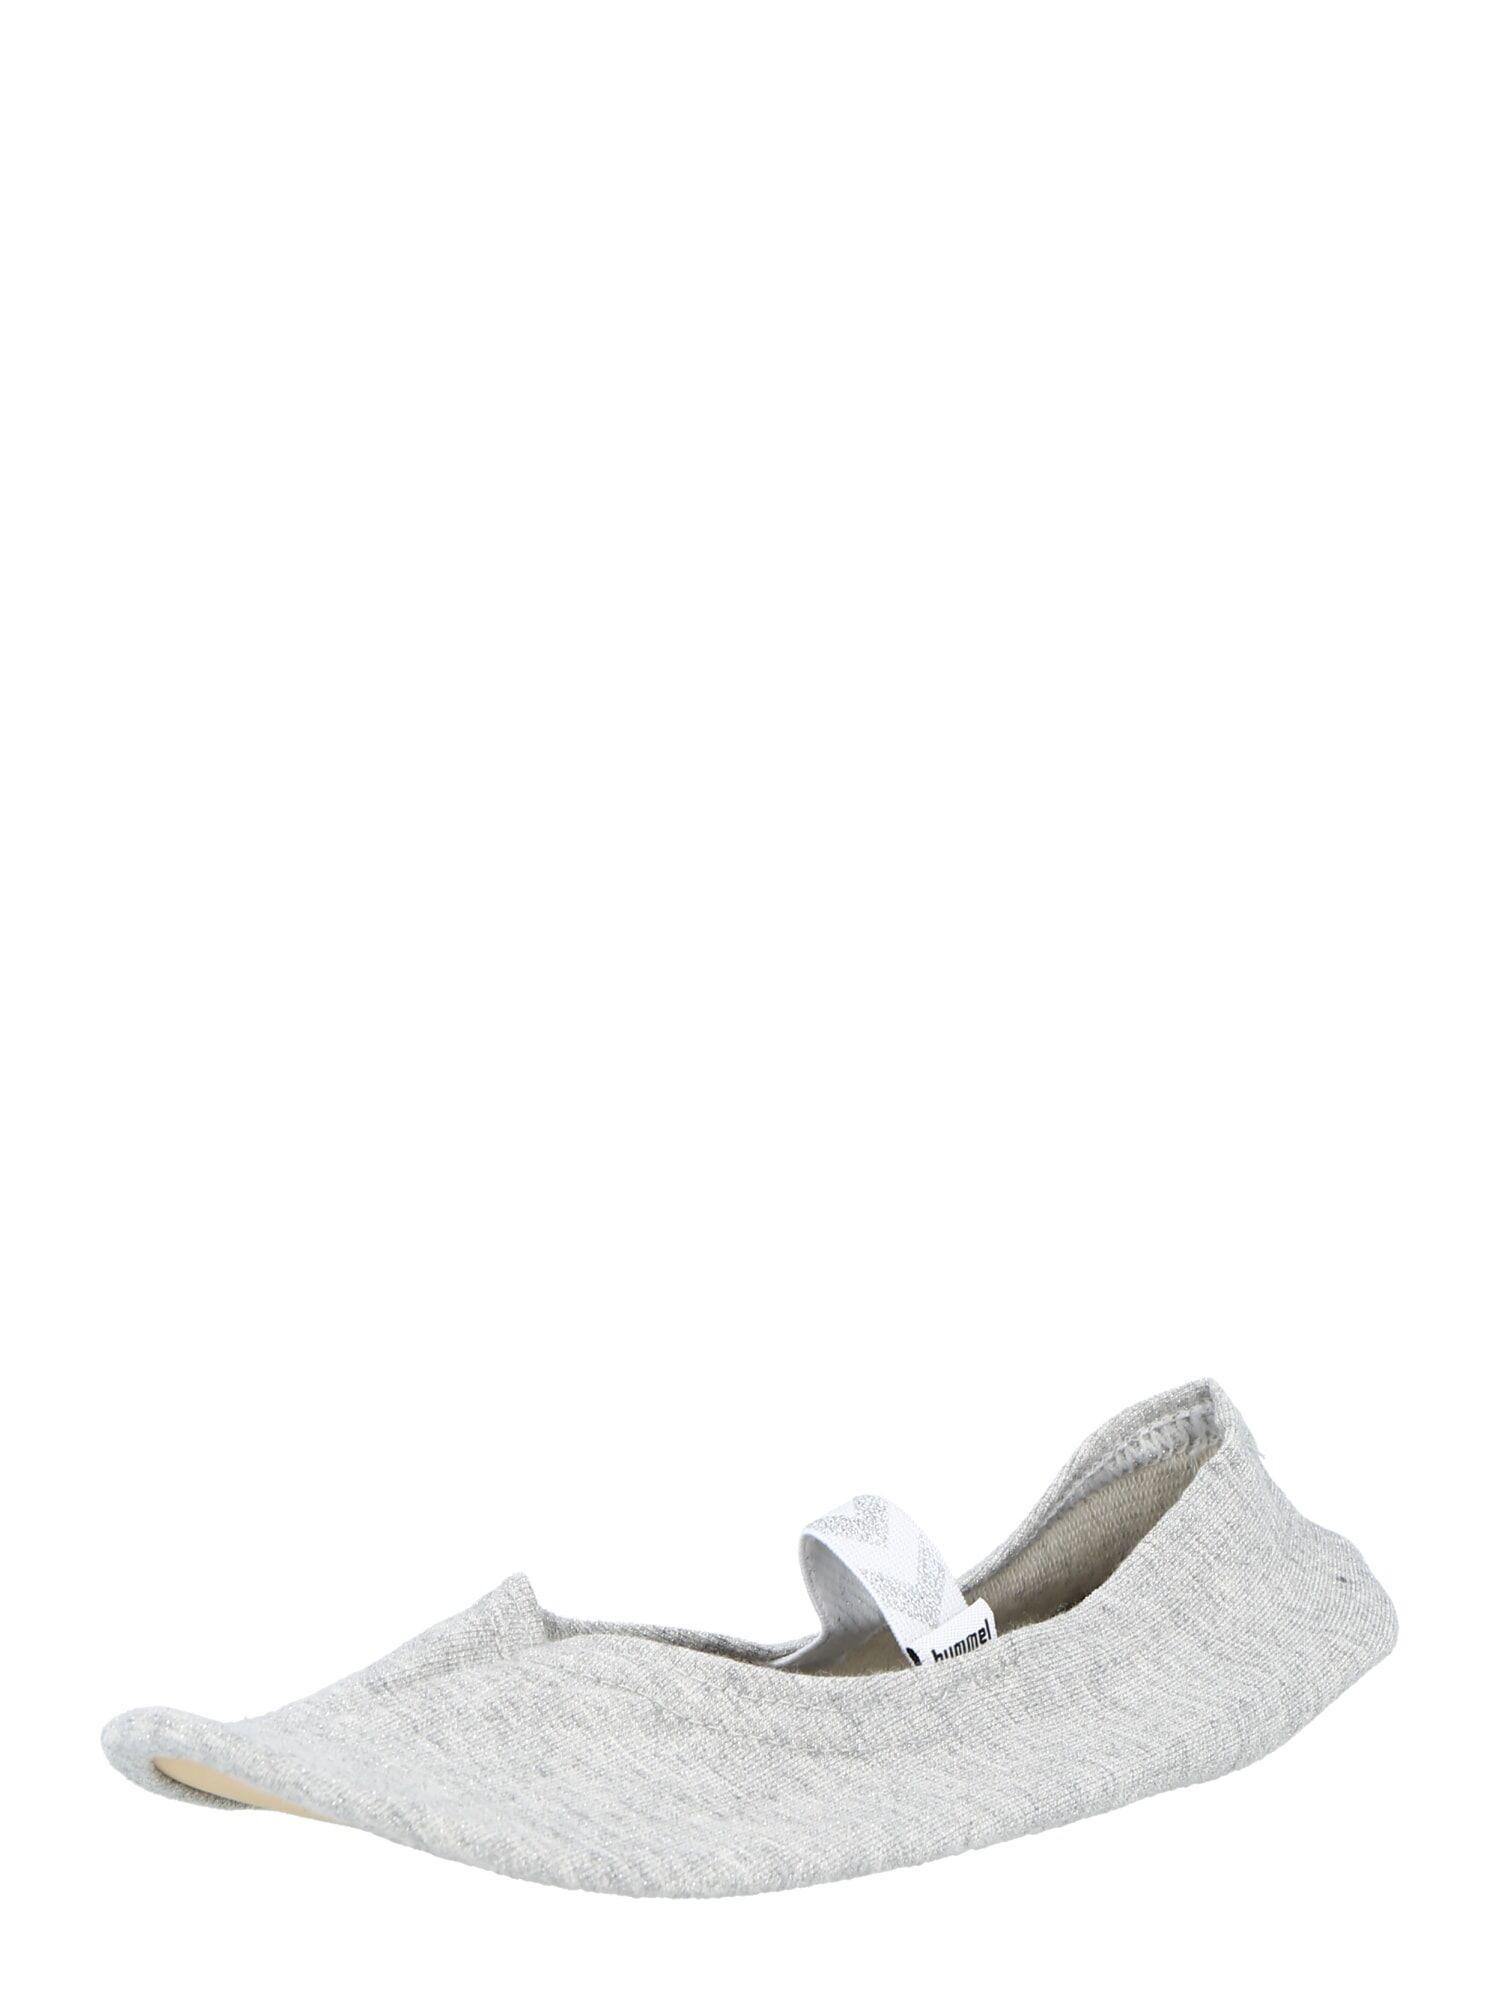 Hummel Chaussure de sport  - Gris - Taille: 22 - boy